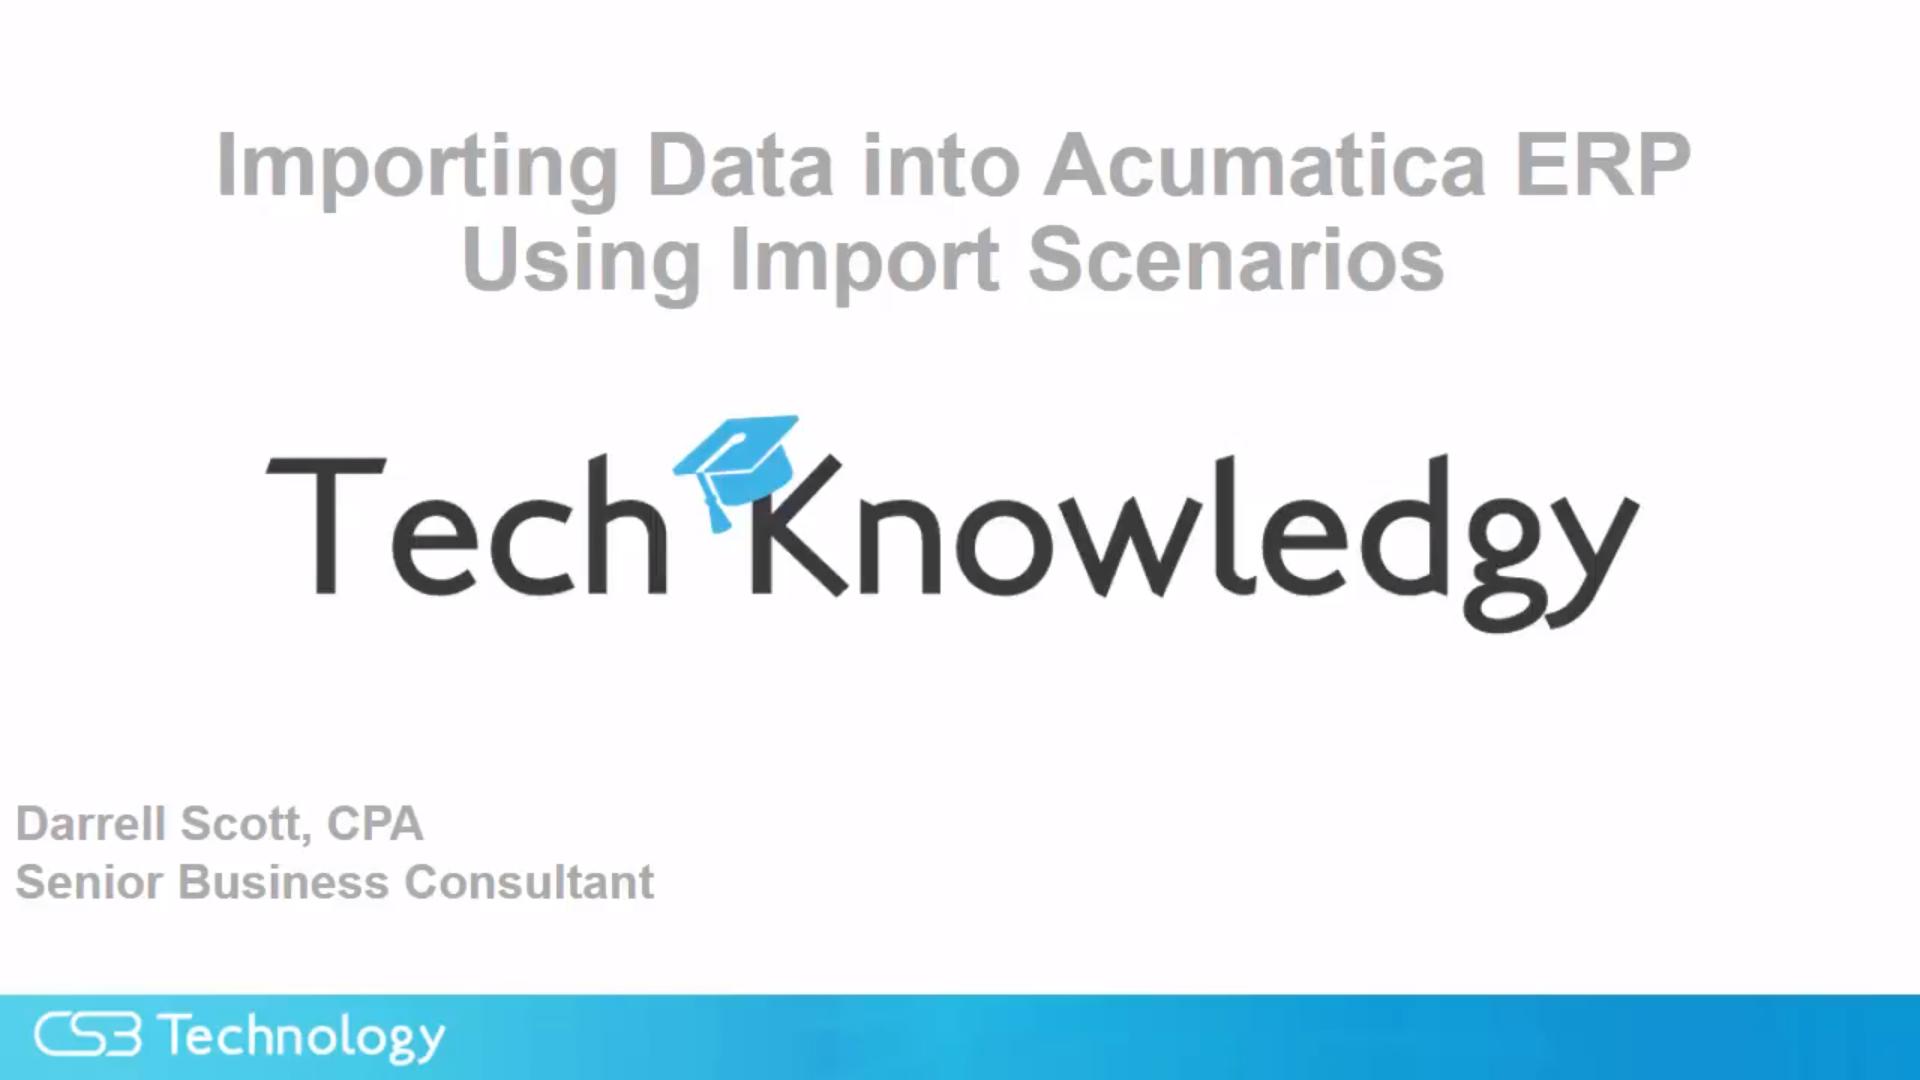 Time to load data in Acumatica, Import Scenarios(templates